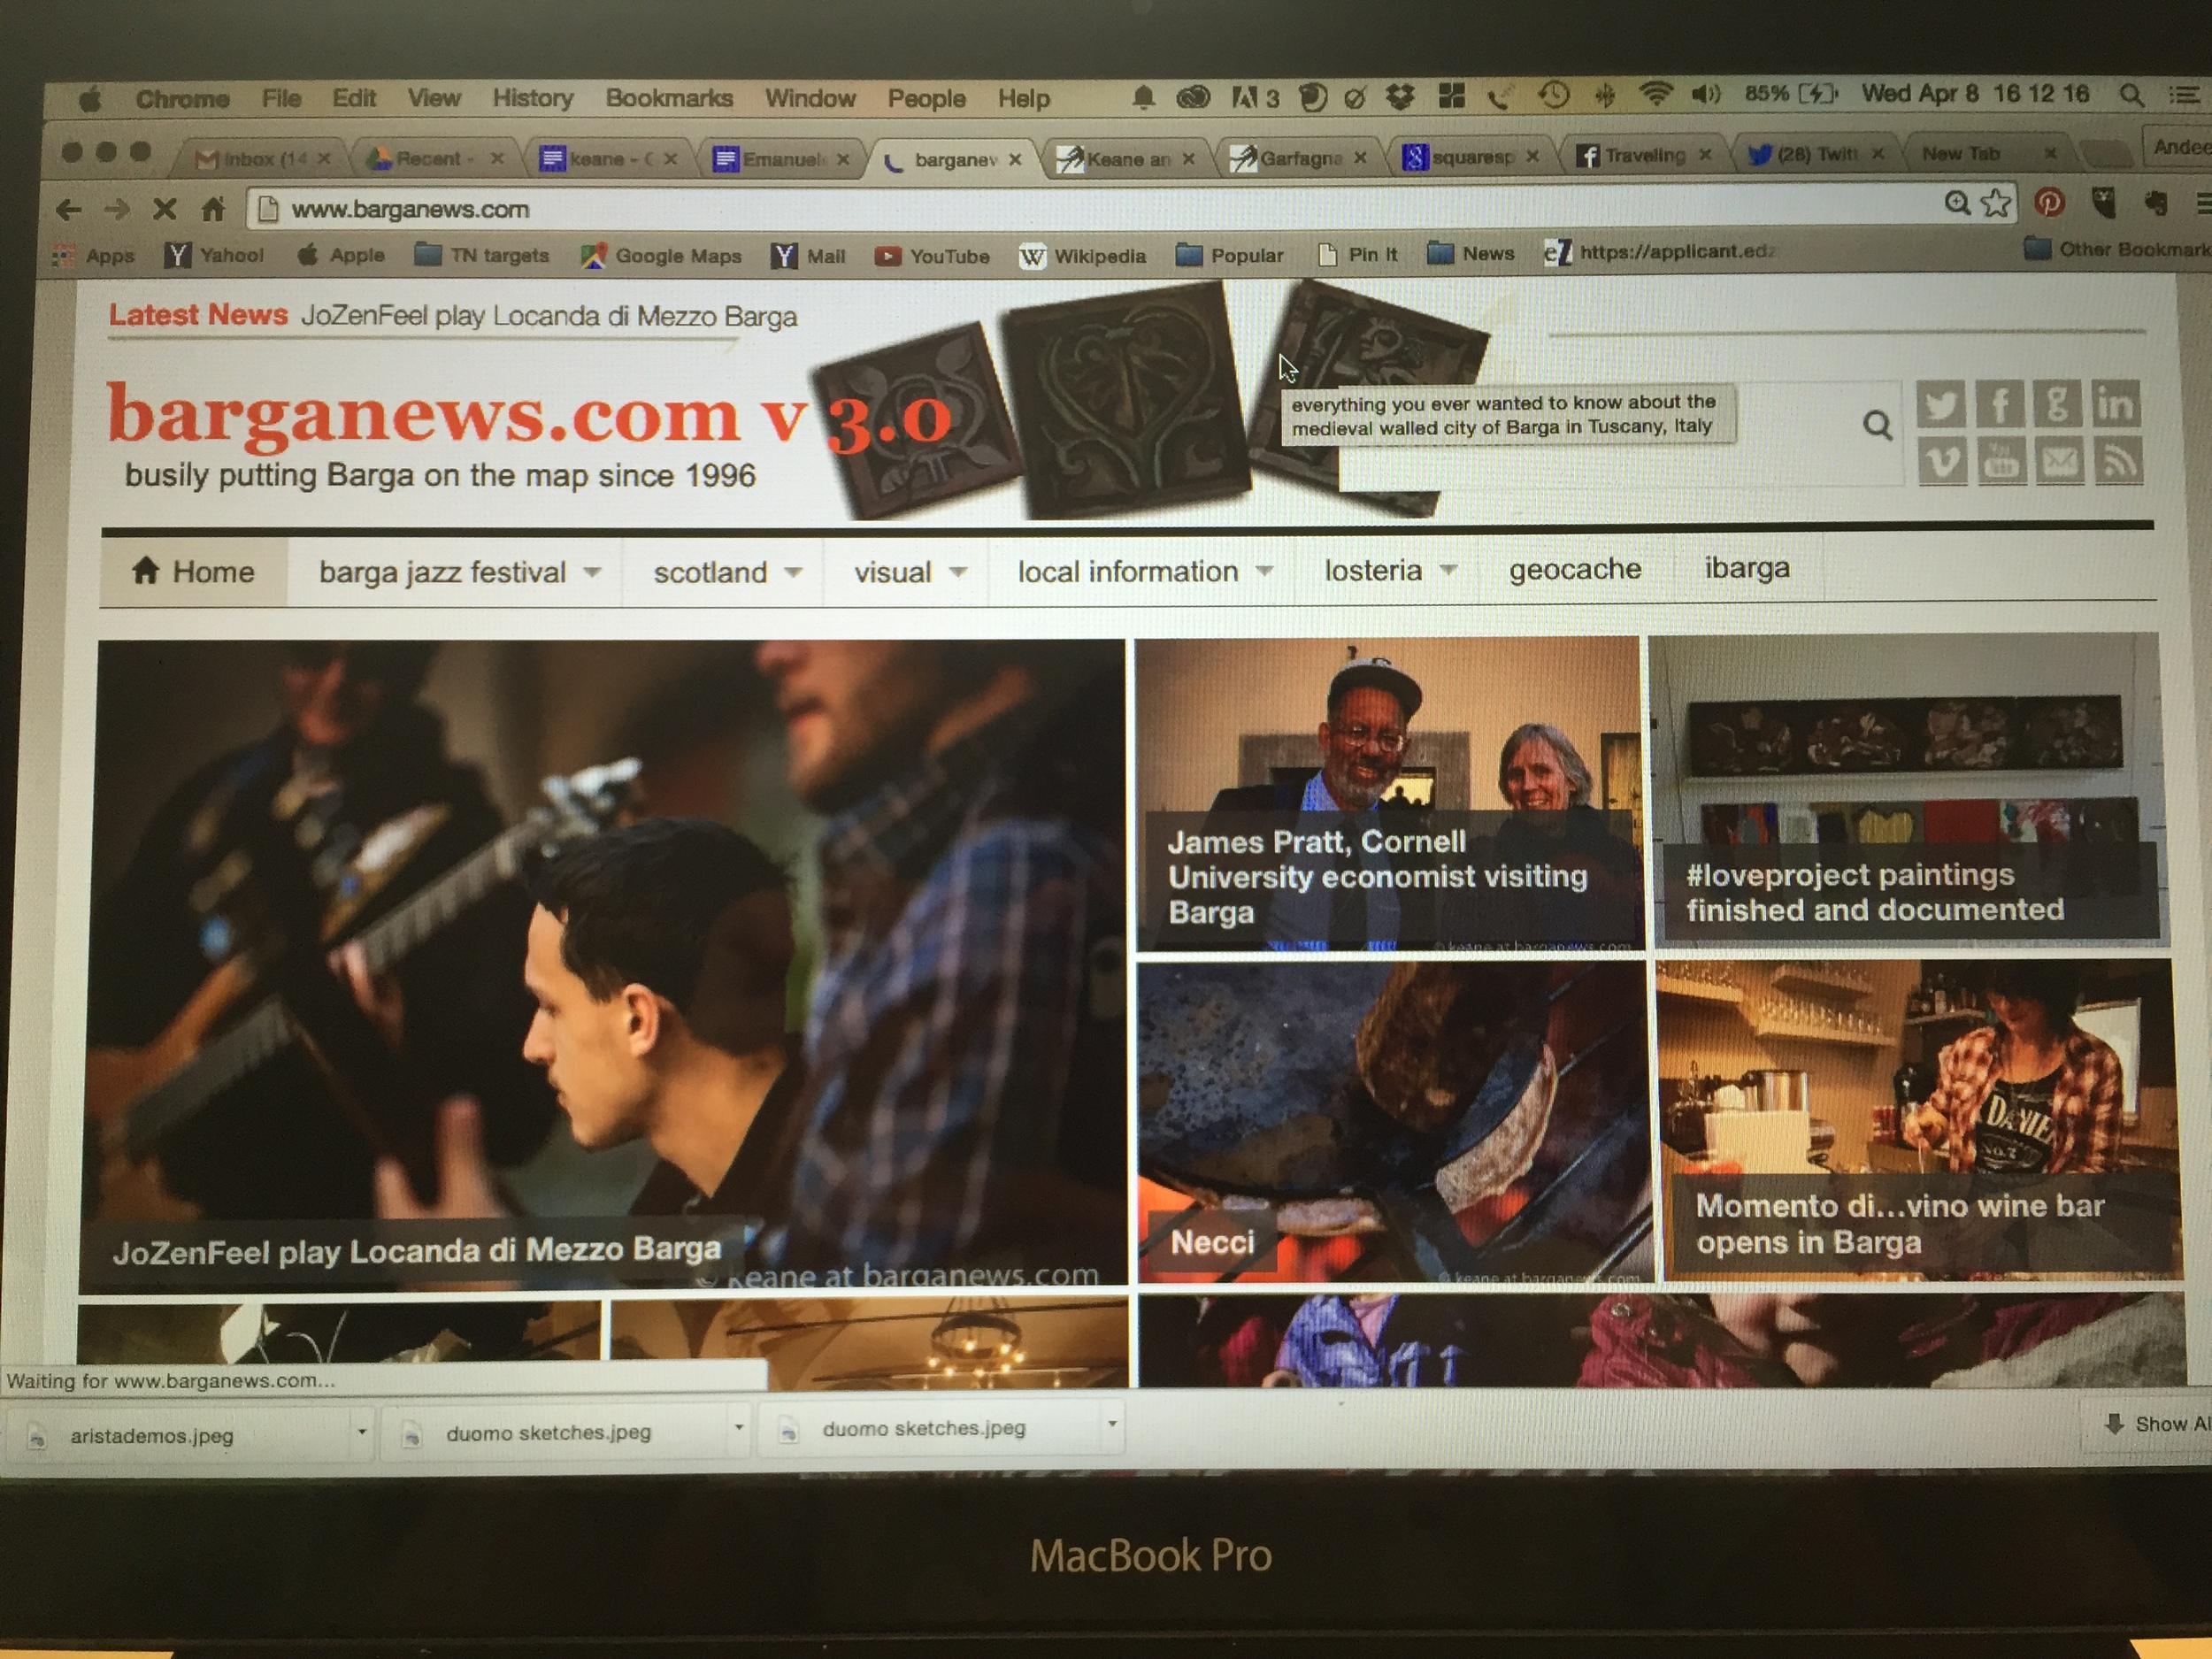 The face of barganews.com